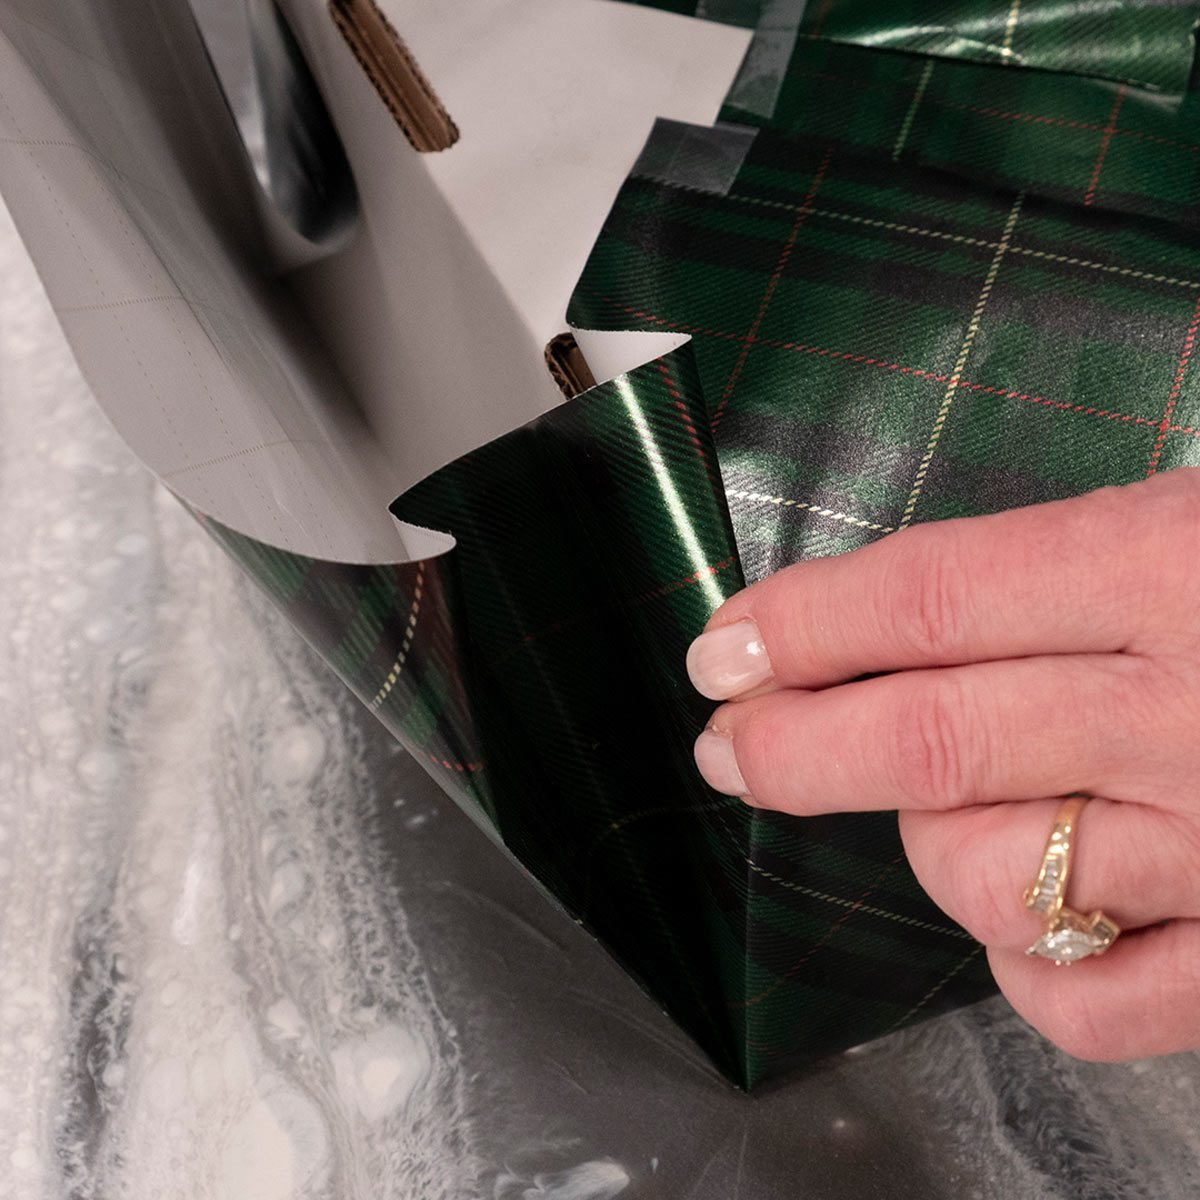 fold present edges flush